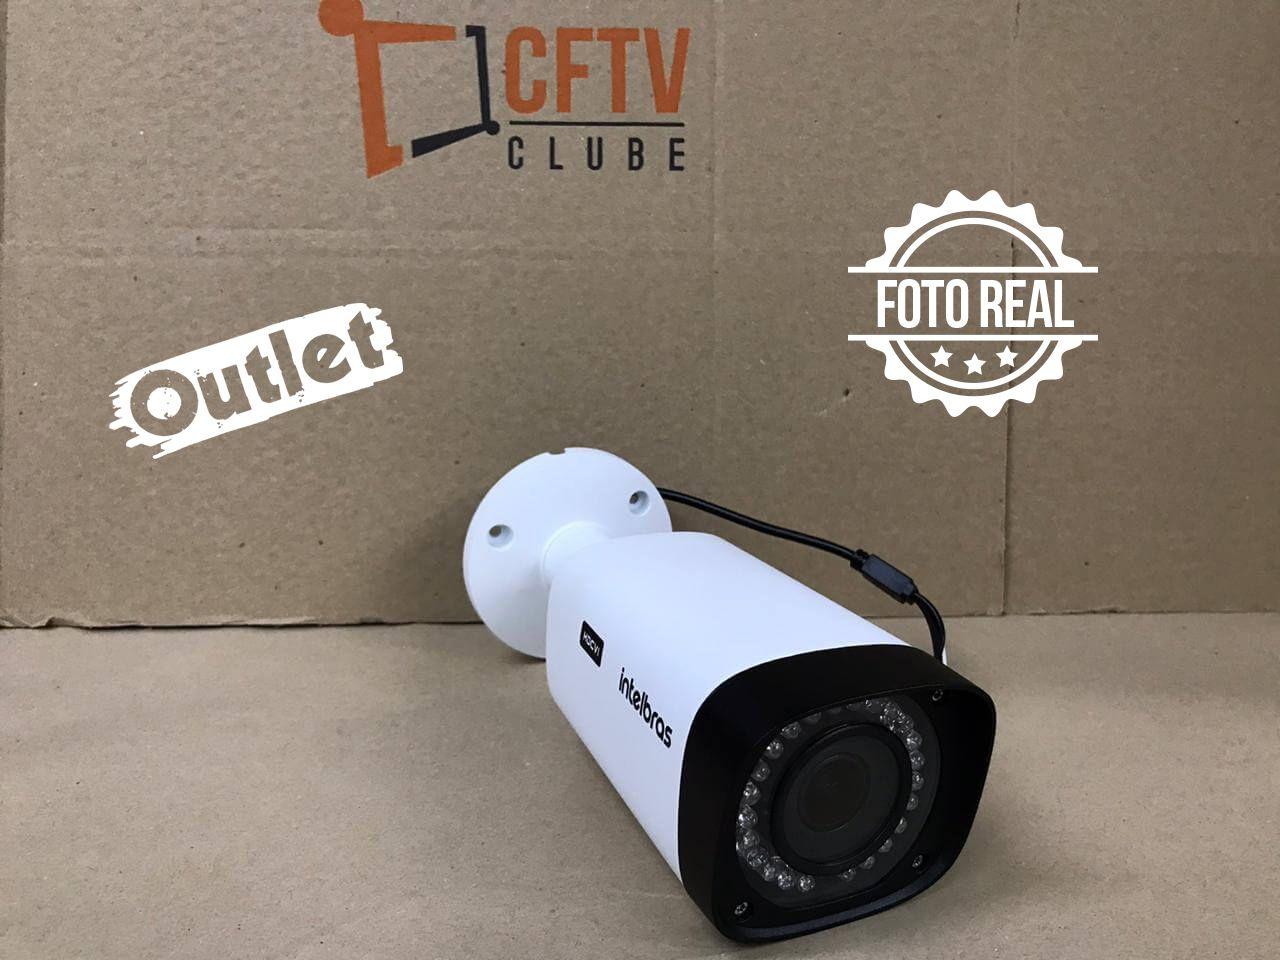 Outlet - Câmera Intelbras Bullet VHD 5250 Z Full HD (2.0MP | 1080p | 2,7mm - 12mm | Metal)  - CFTV Clube | Brasil